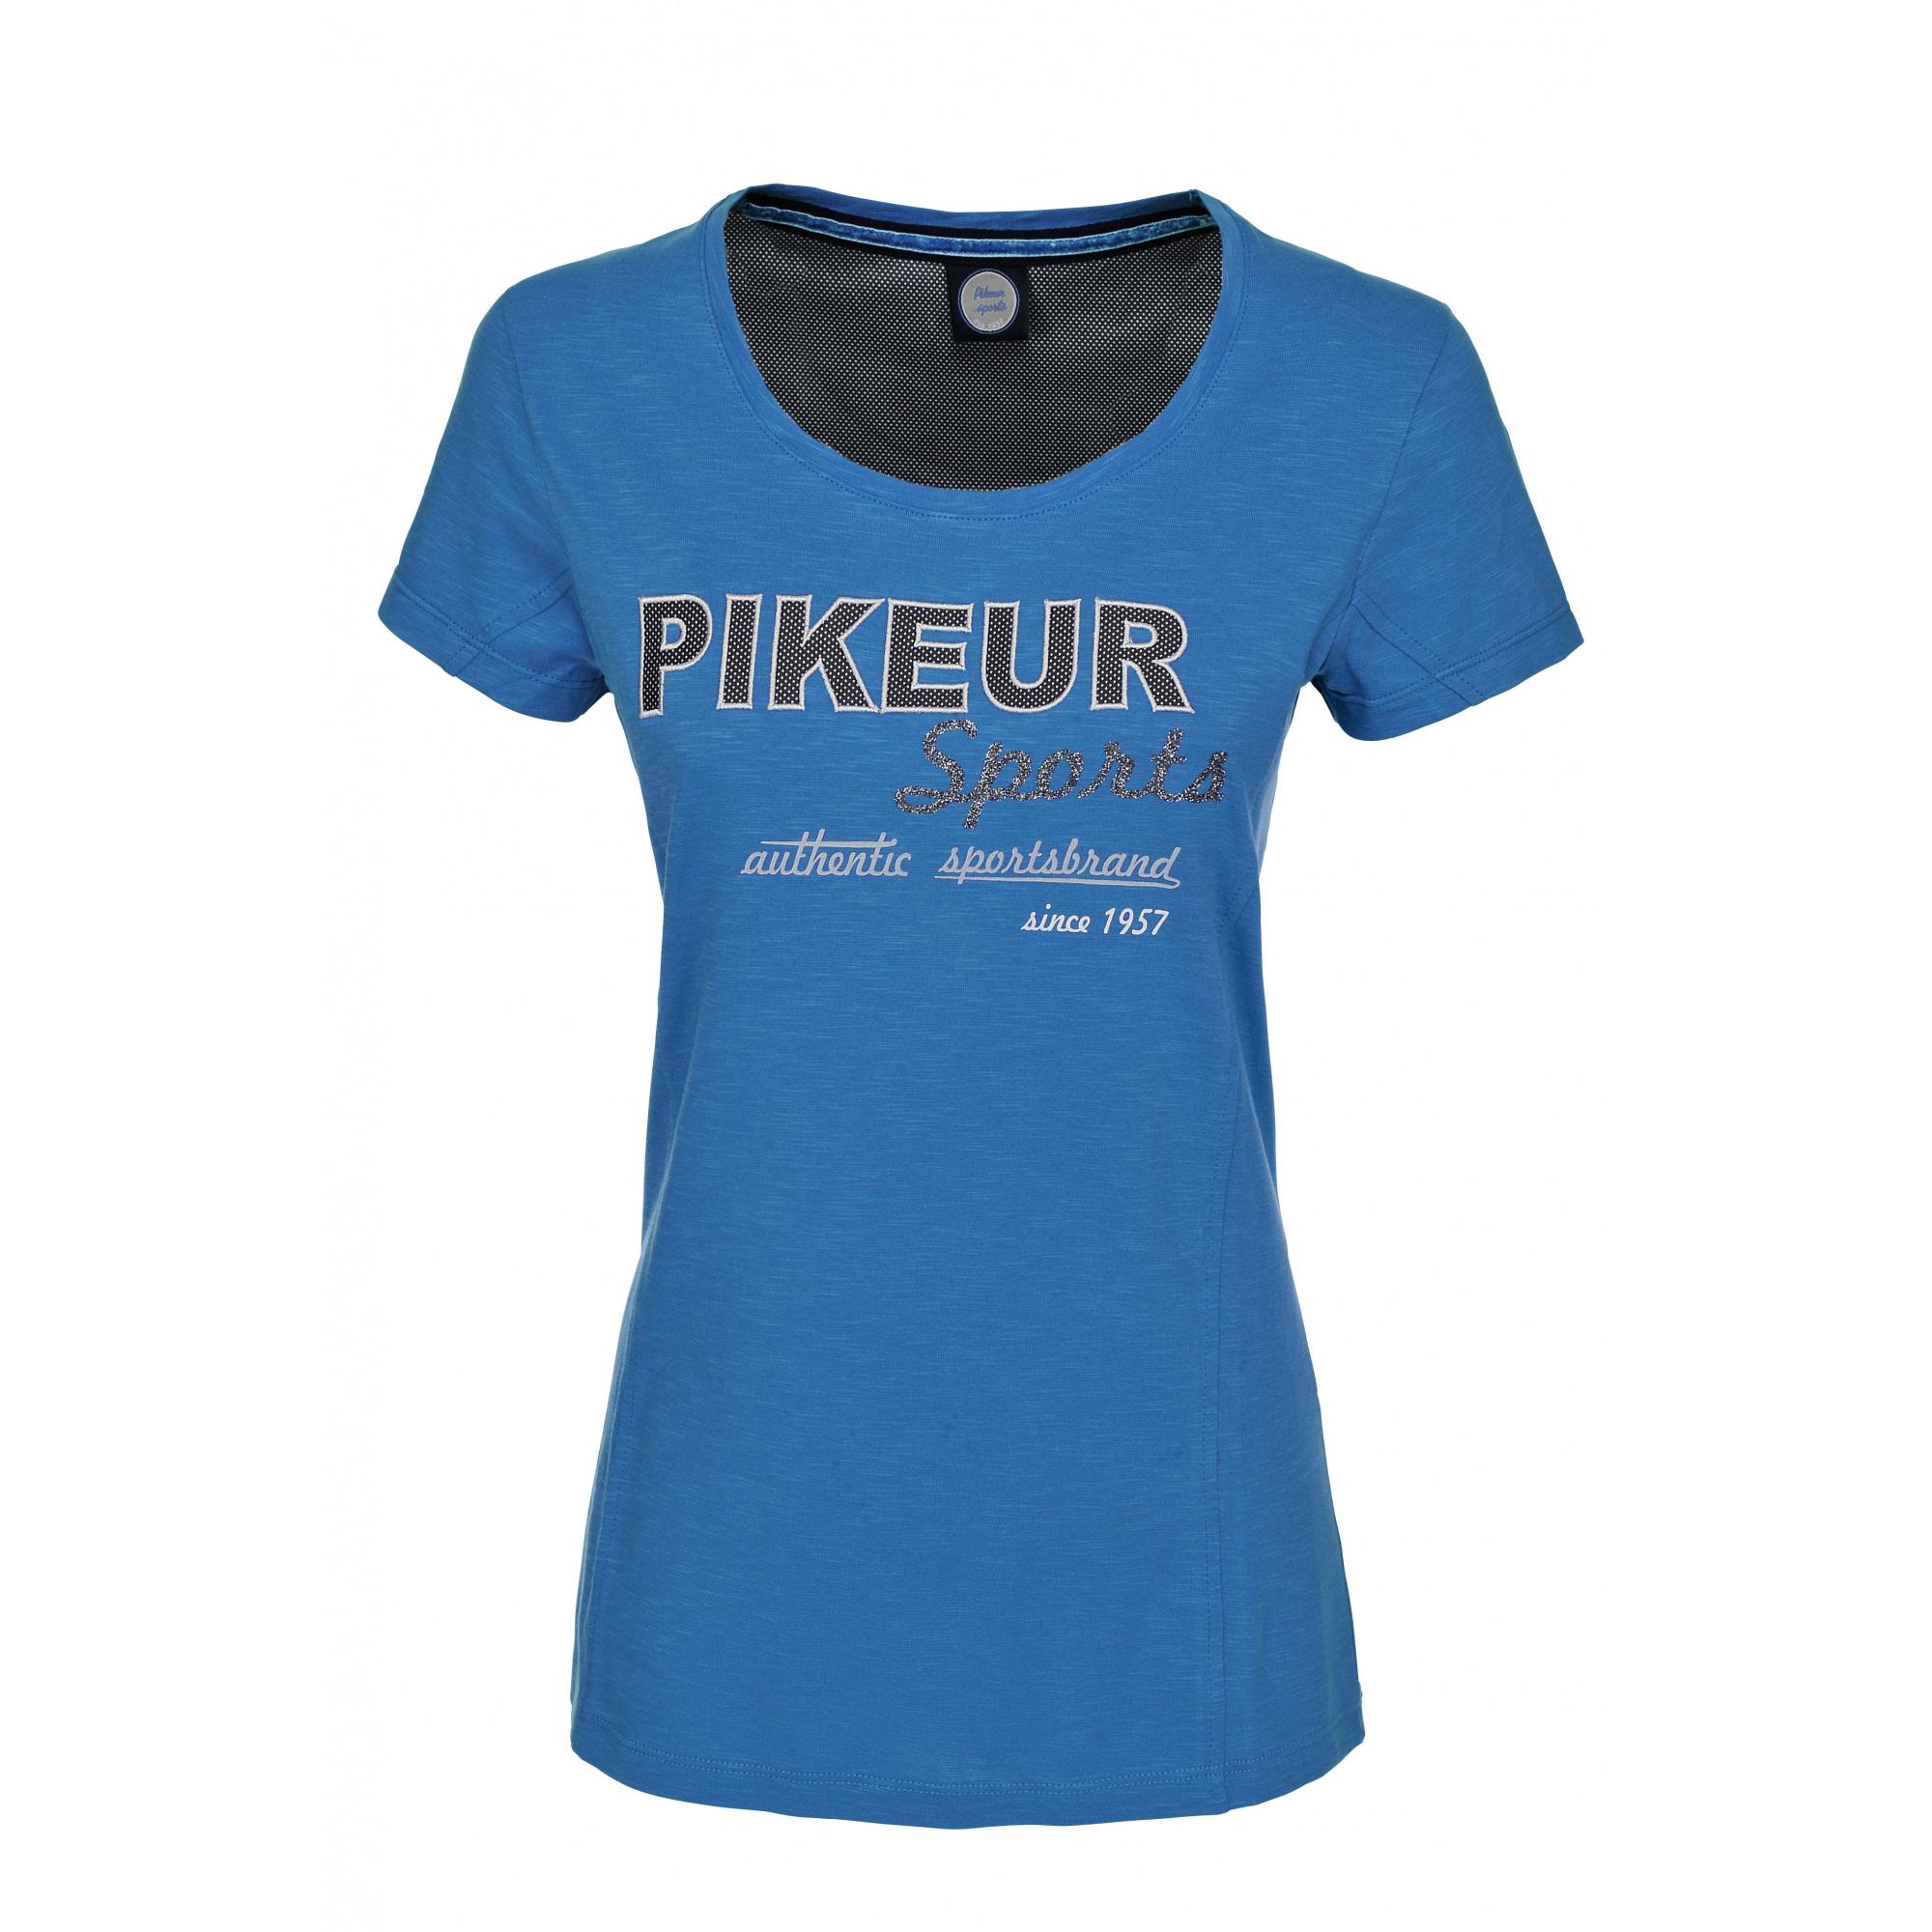 Reitbekleidung Damen-Reitbekleidung Pikeur T Shirt L